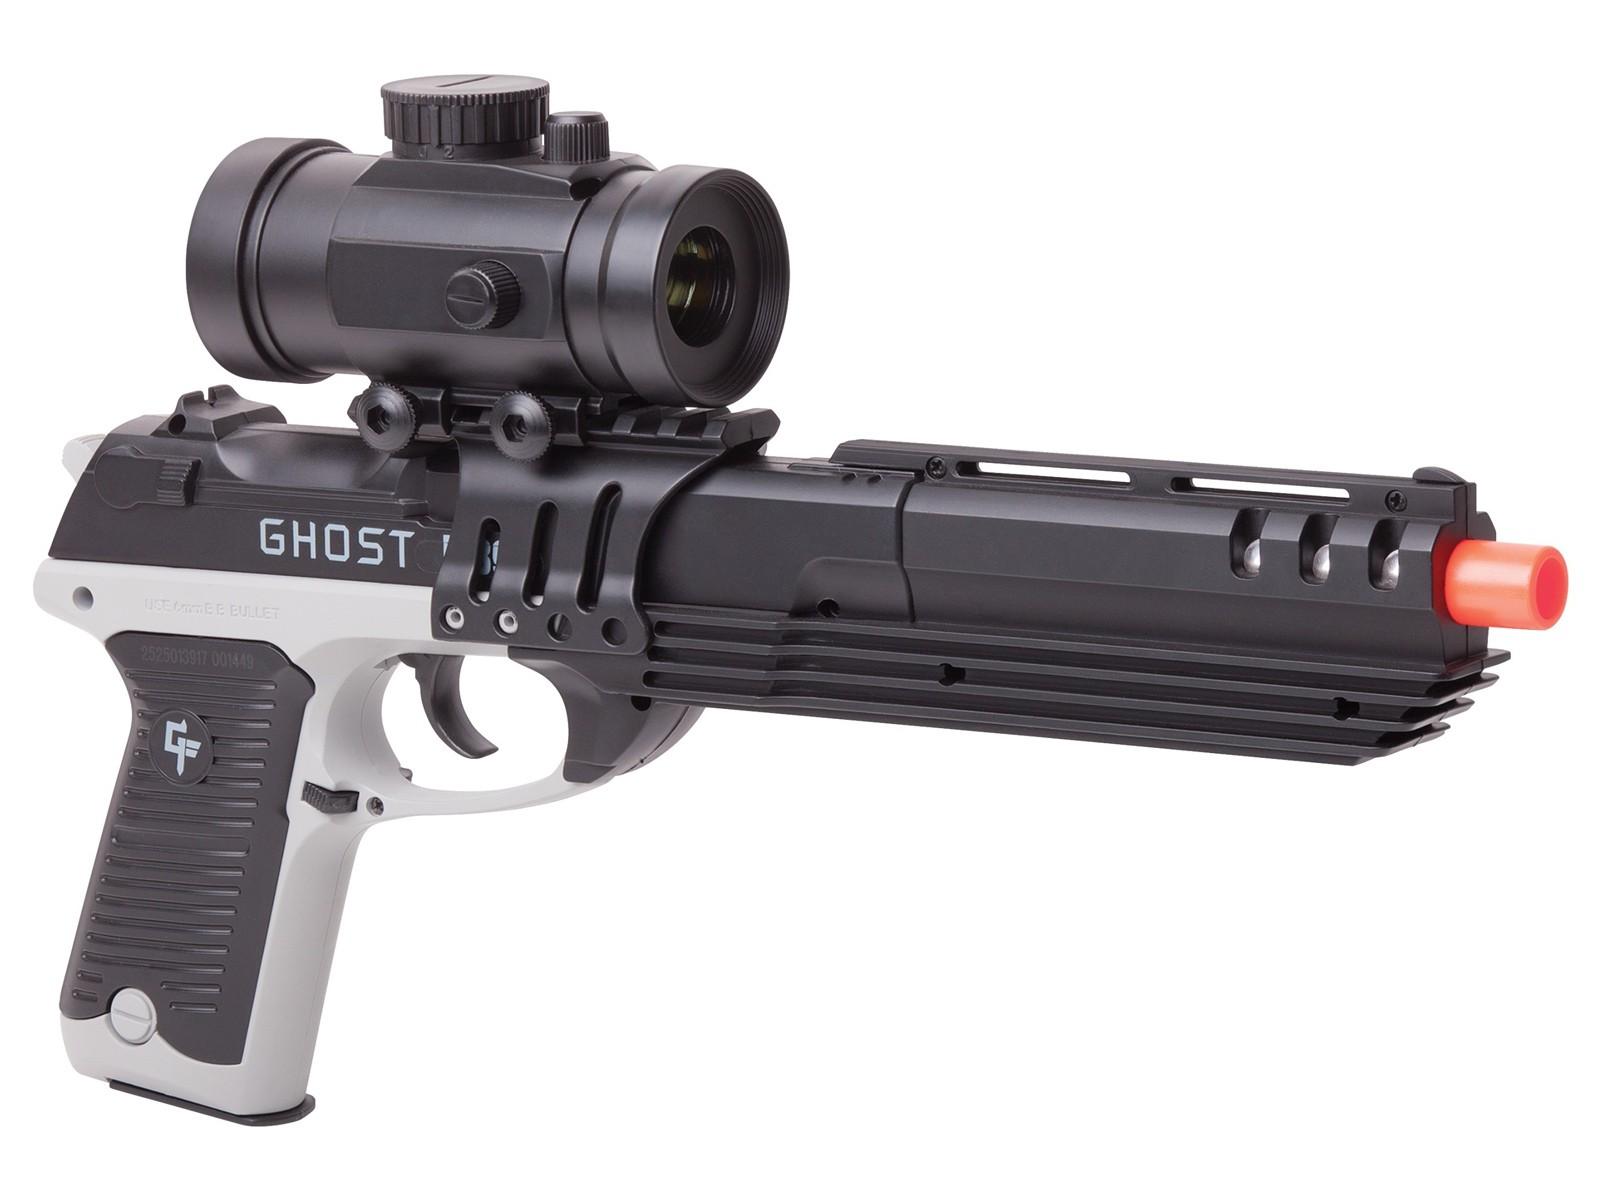 Crosman_Ghost_Mayhem_Spring_Powered_Tactical_Airsoft_Pistol_6mm